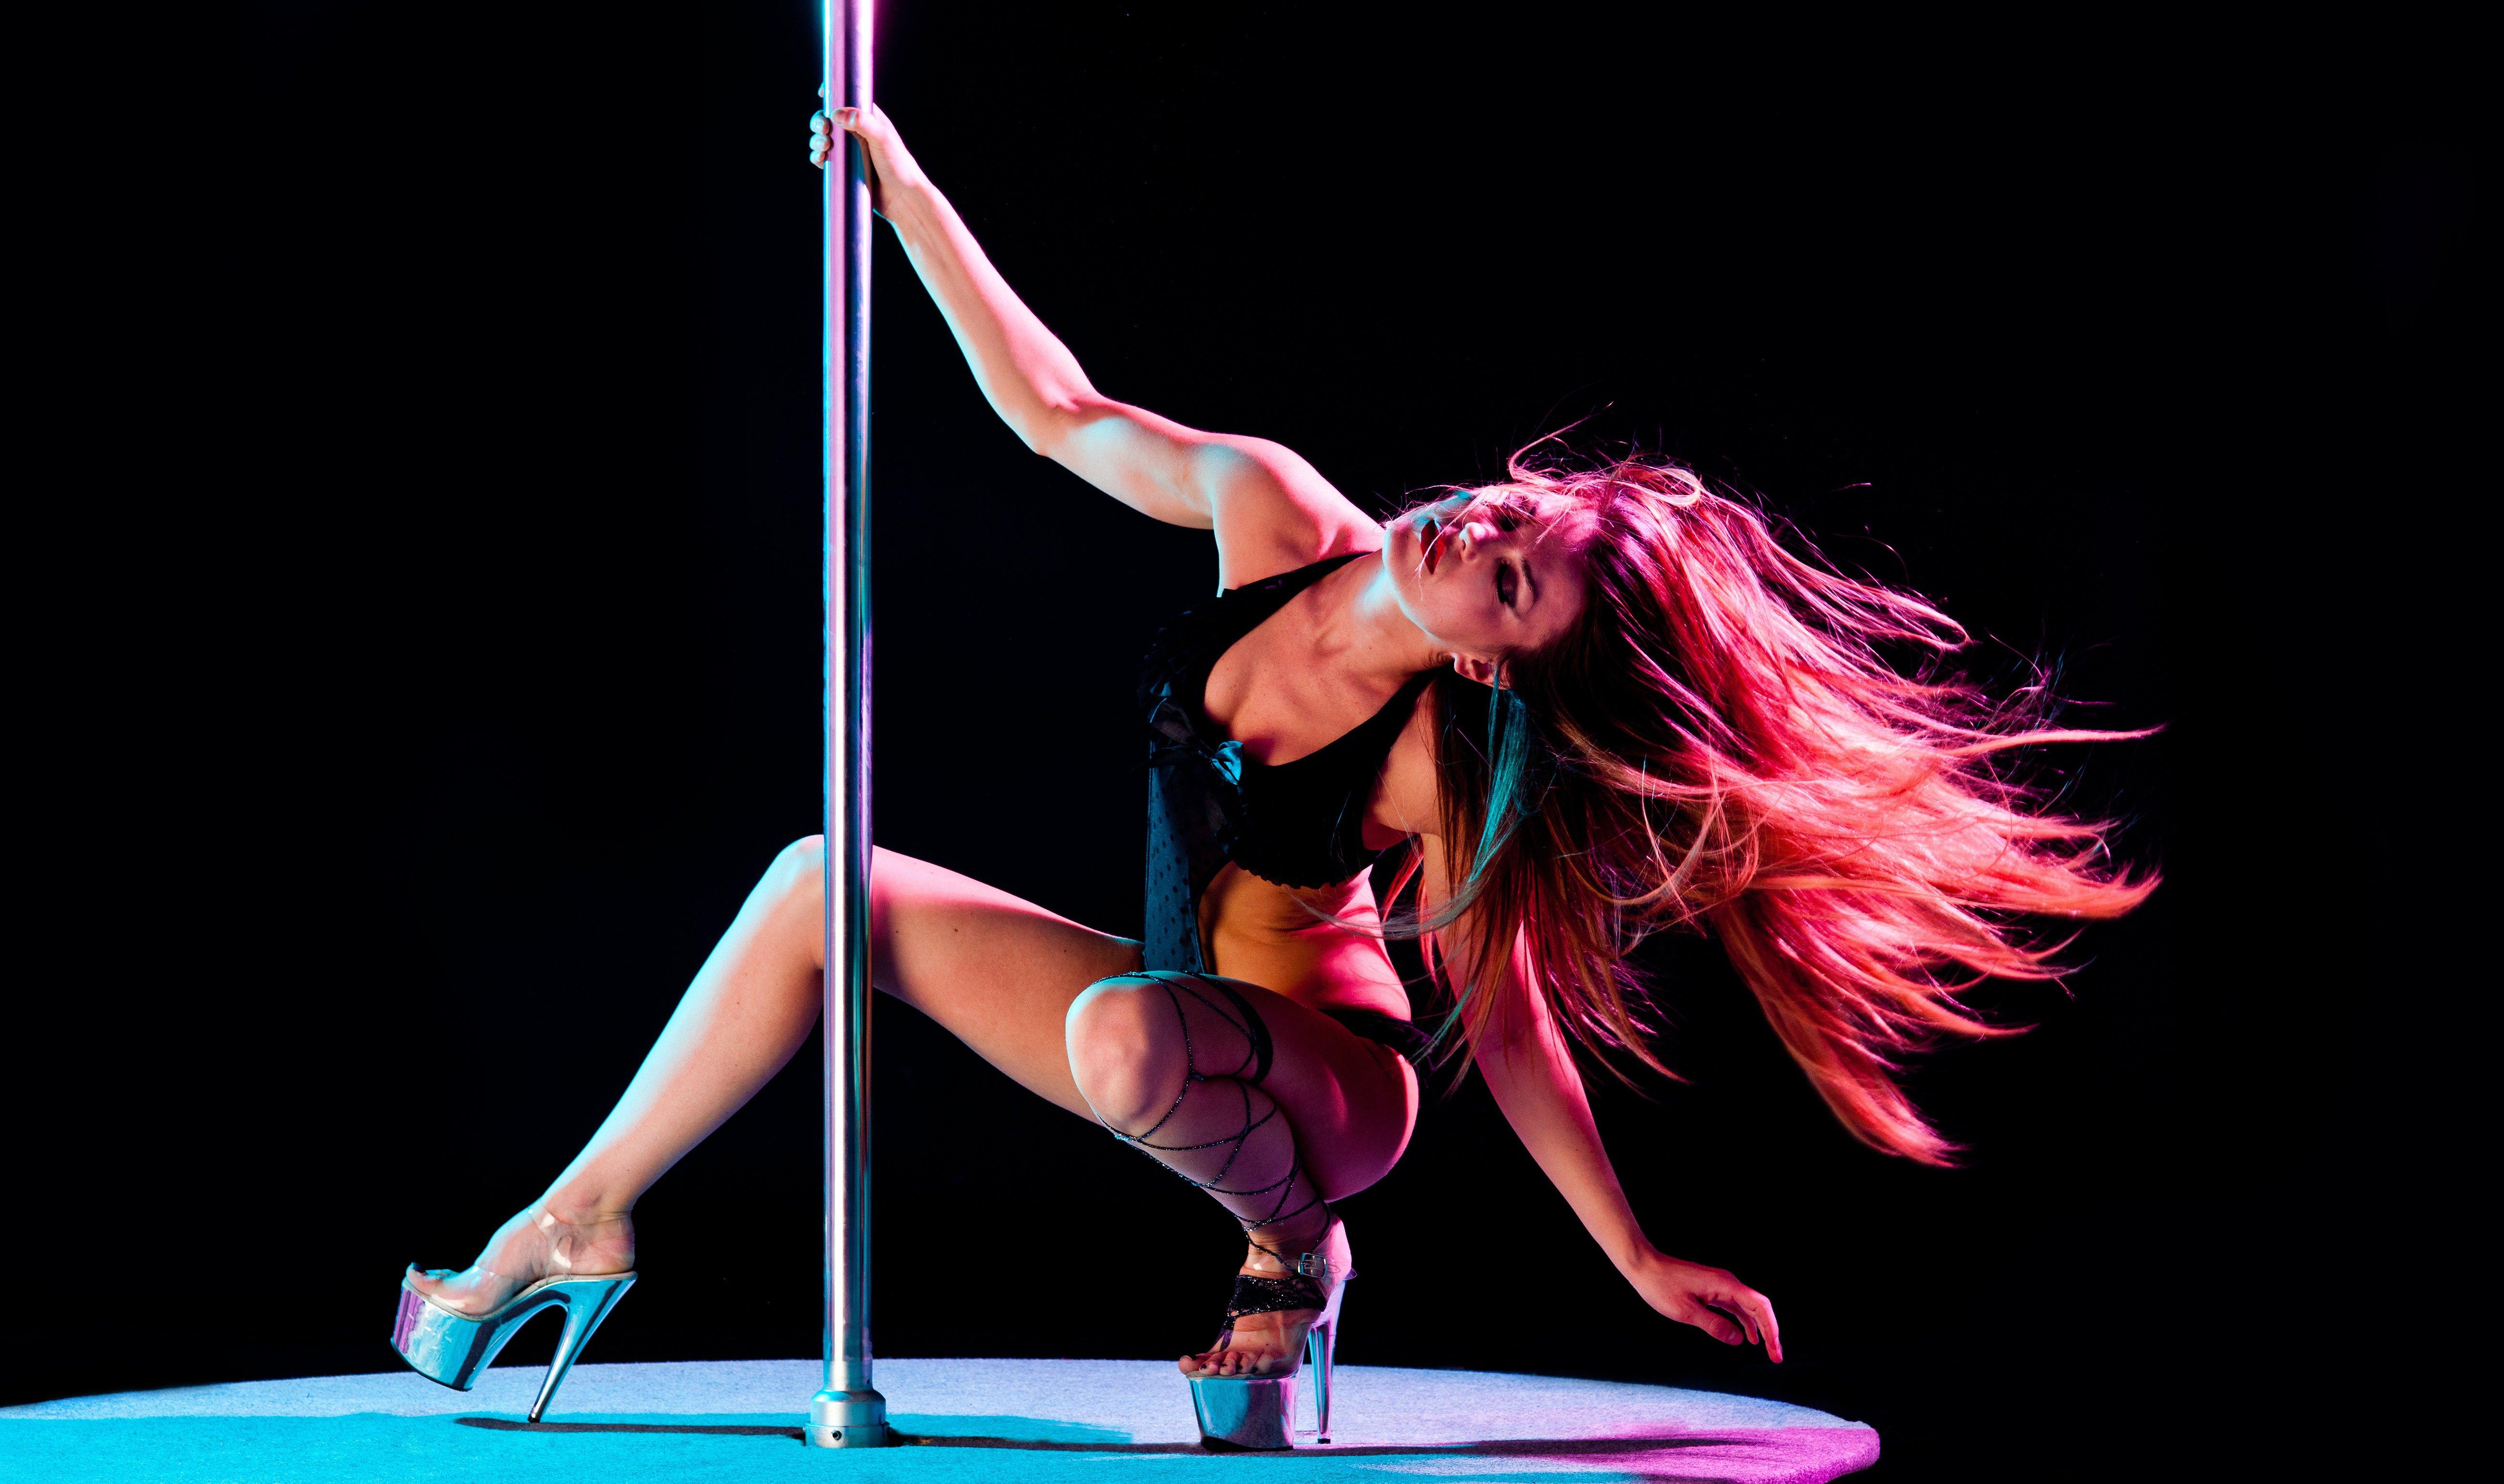 Фото стриптизёрш танцующих 5 фотография